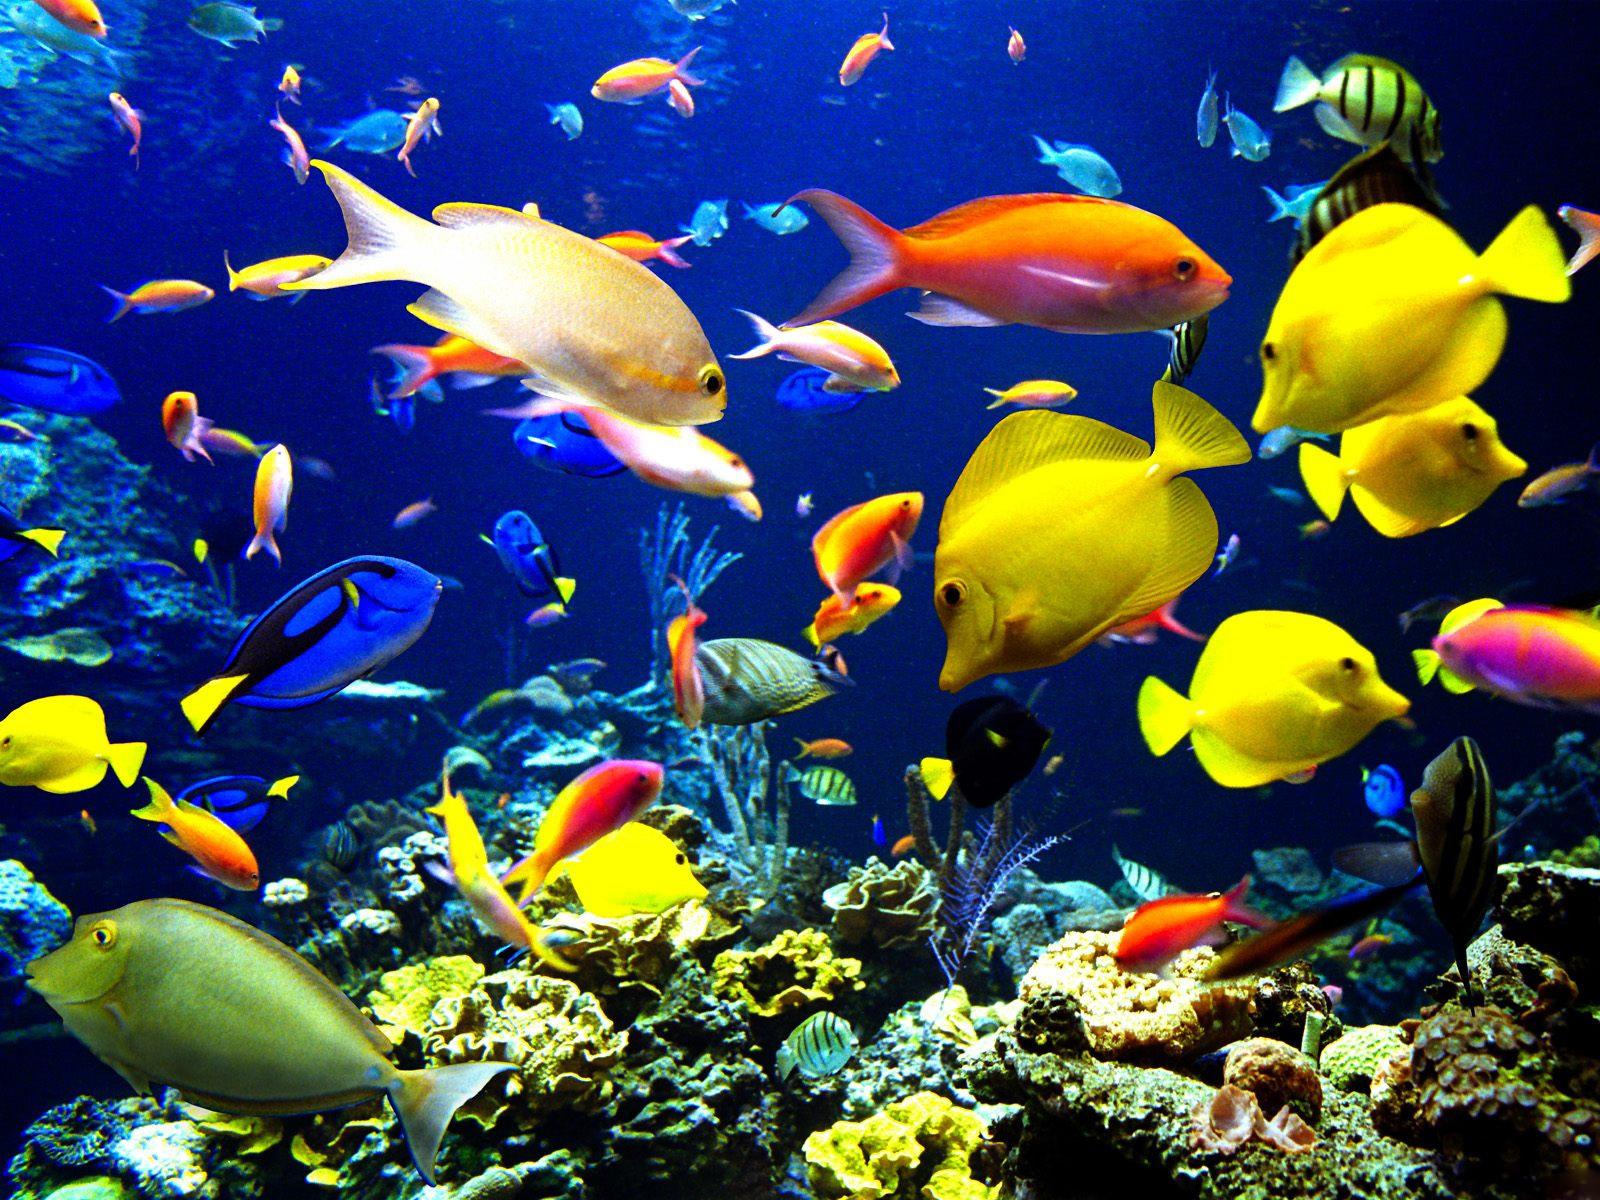 50 Underwater HD Wallpapers [16001200] 1600x1200